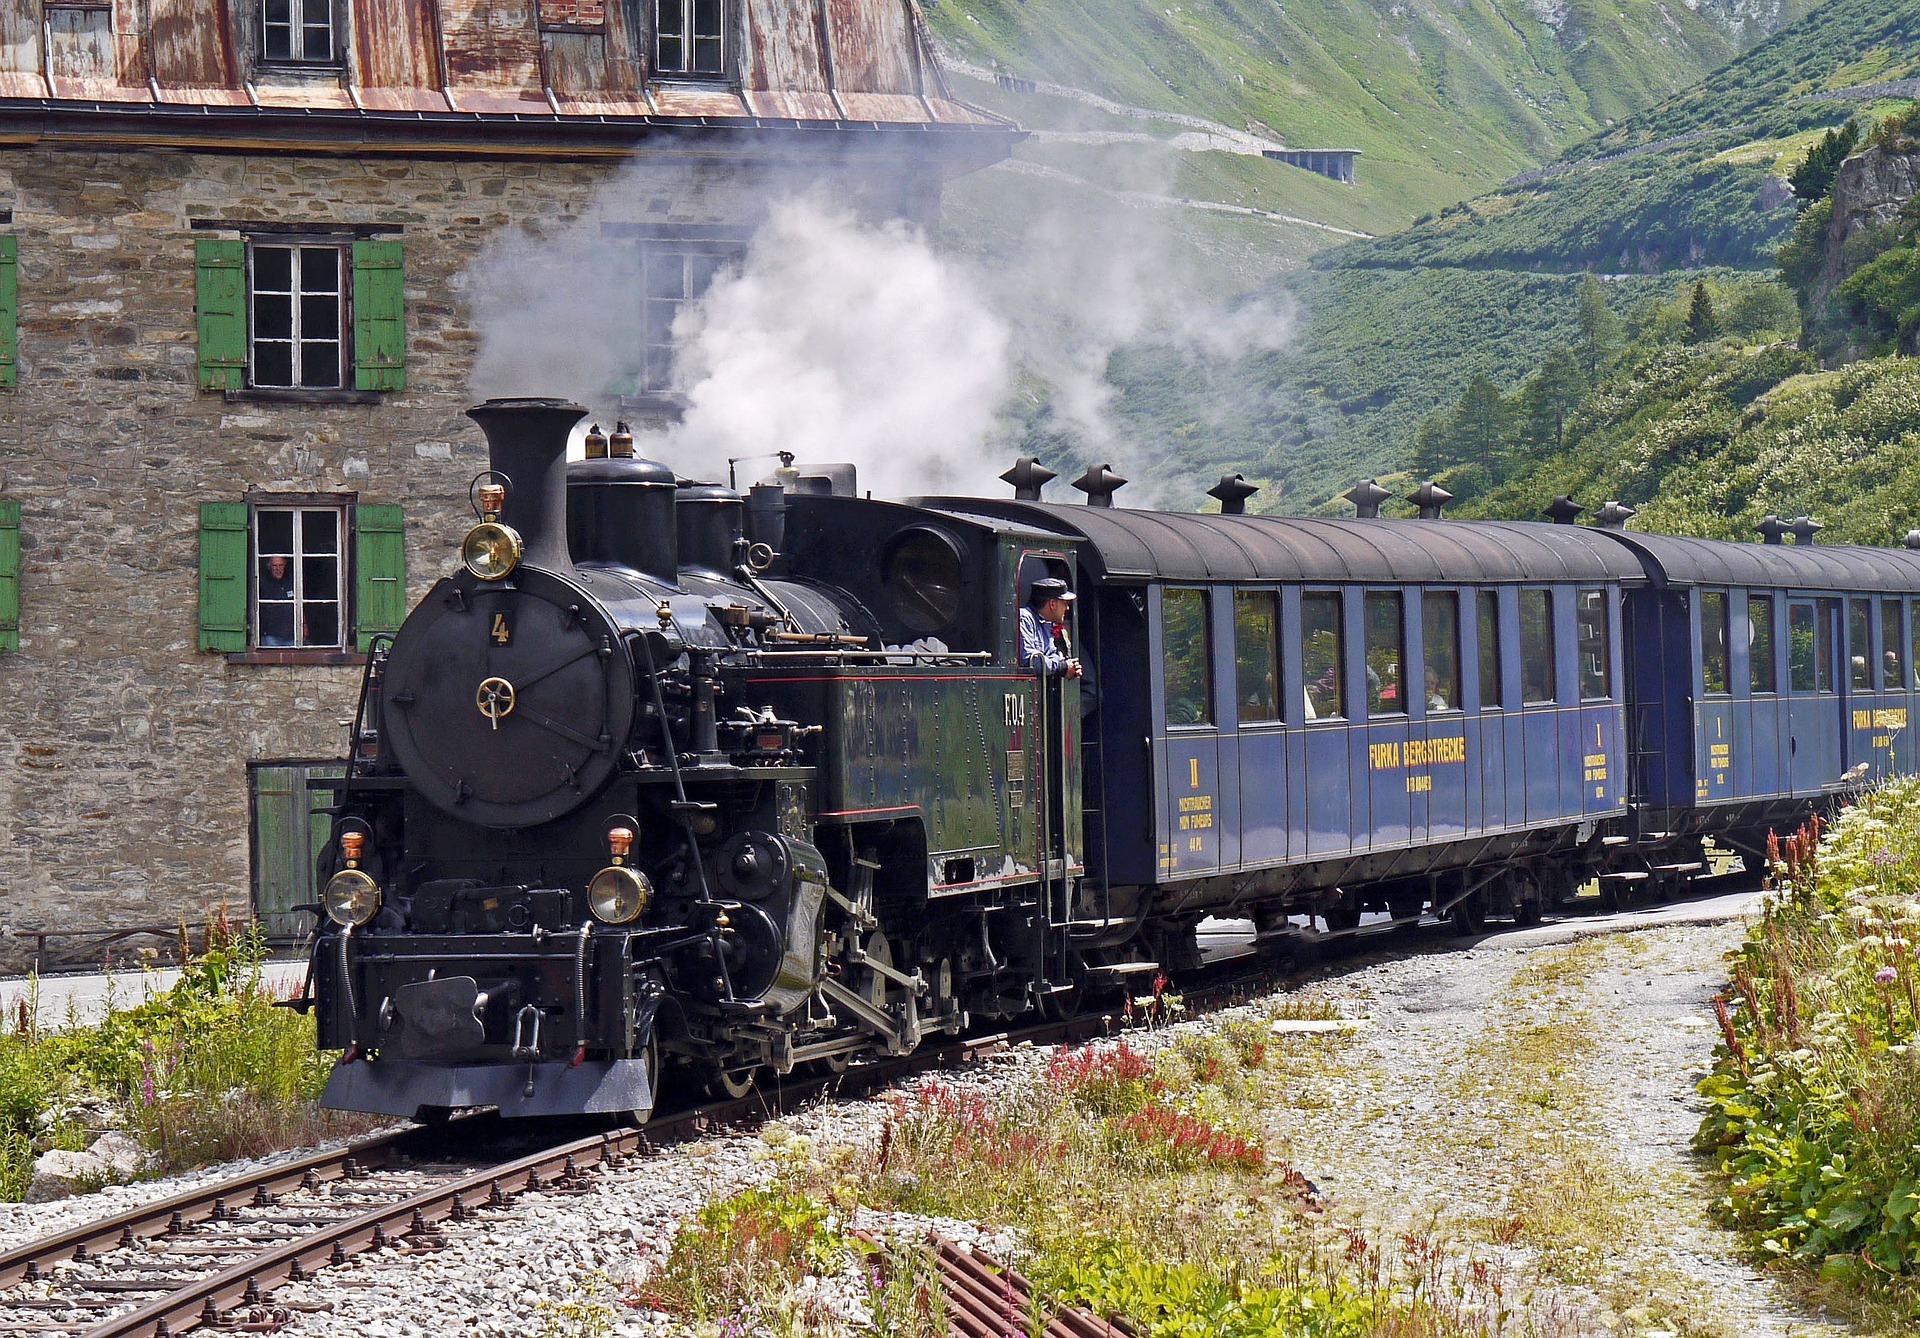 treno a vapore, treno, locomotiva, carri, Furka bahn, Alpi, Svizzera - Sfondi HD - Professor-falken.com